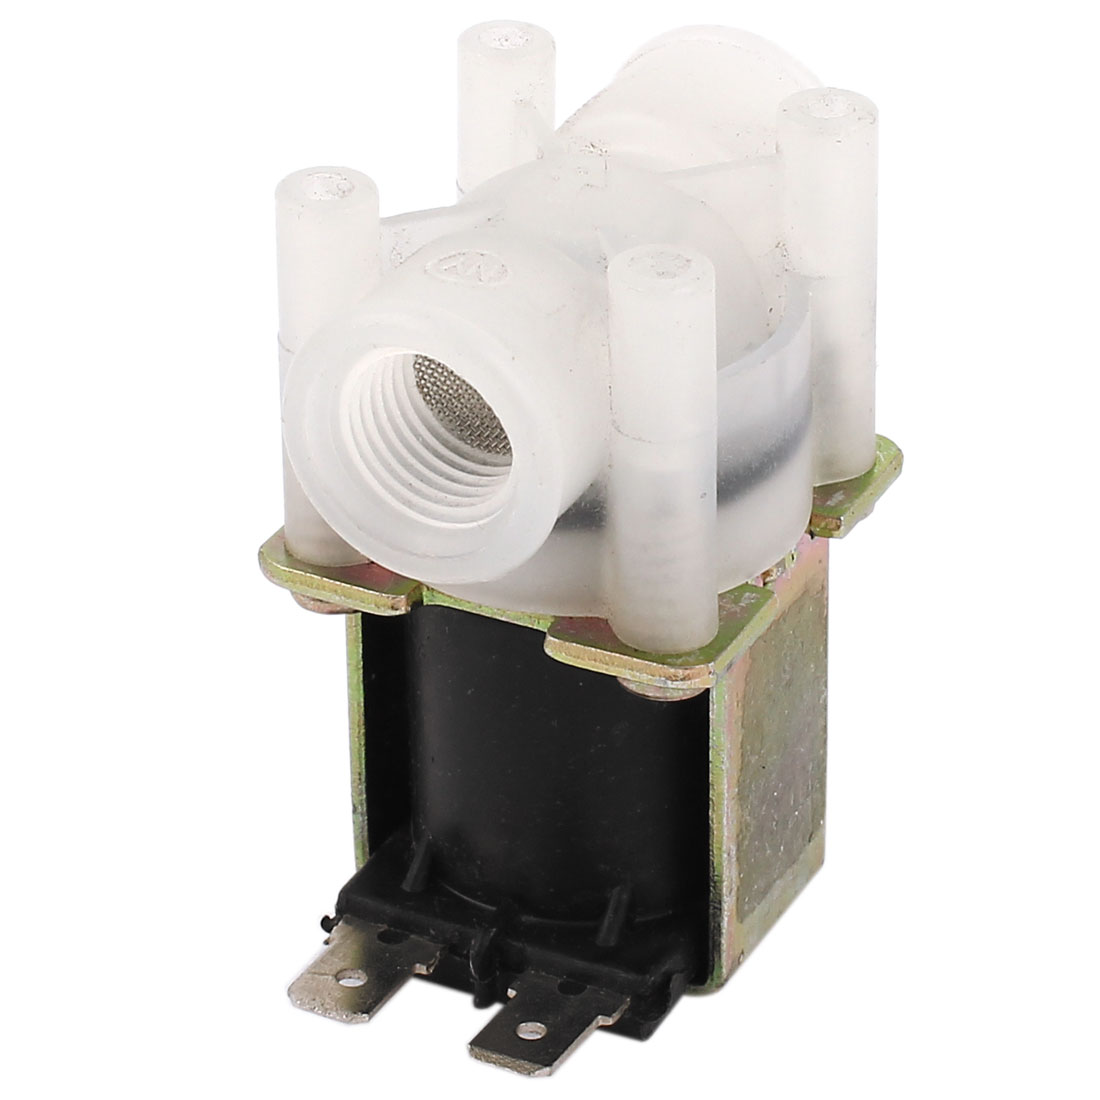 "DC 24V 1/4"" Female Thread Waste Water Flush Solenoid Valve RO System"